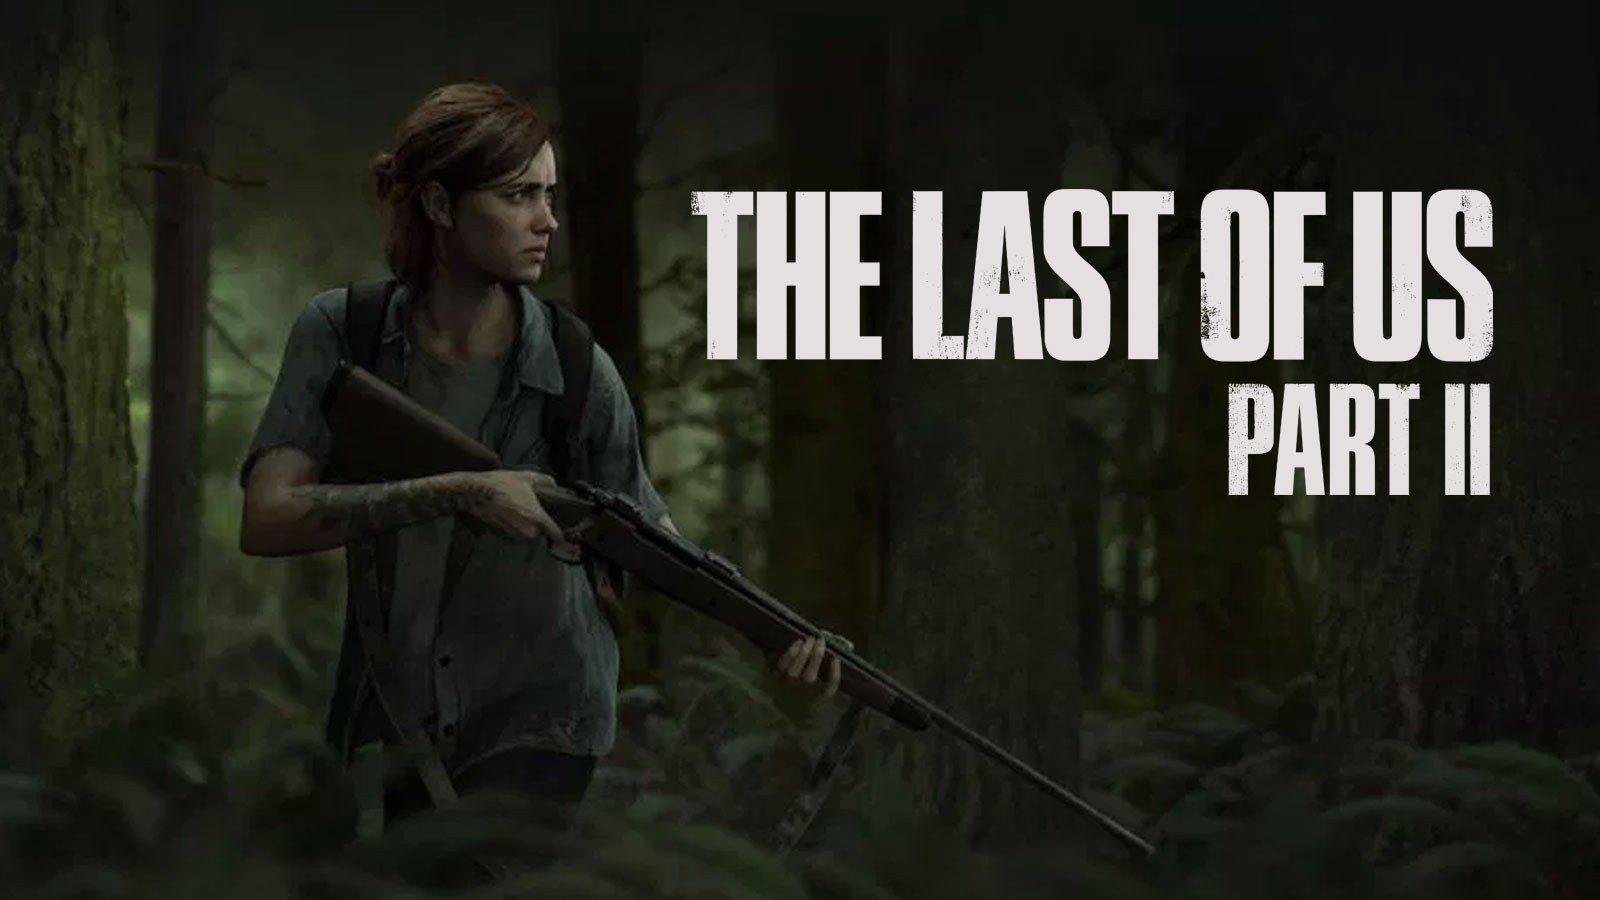 The lastof us parte 2